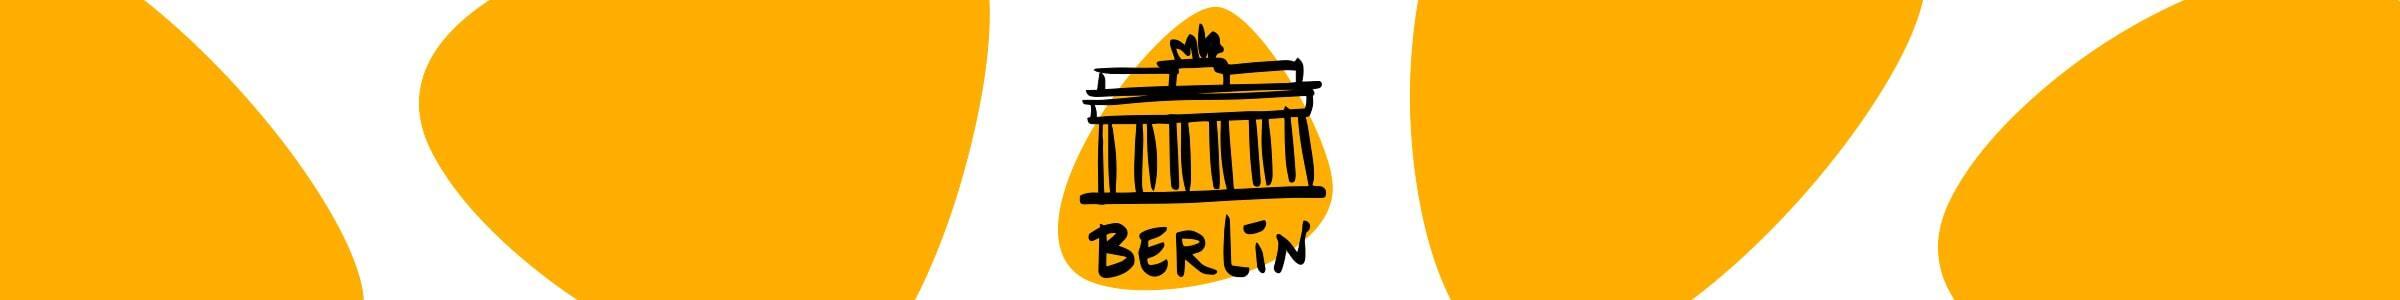 Category_Teaser_Header_Berlin_2400x300-min